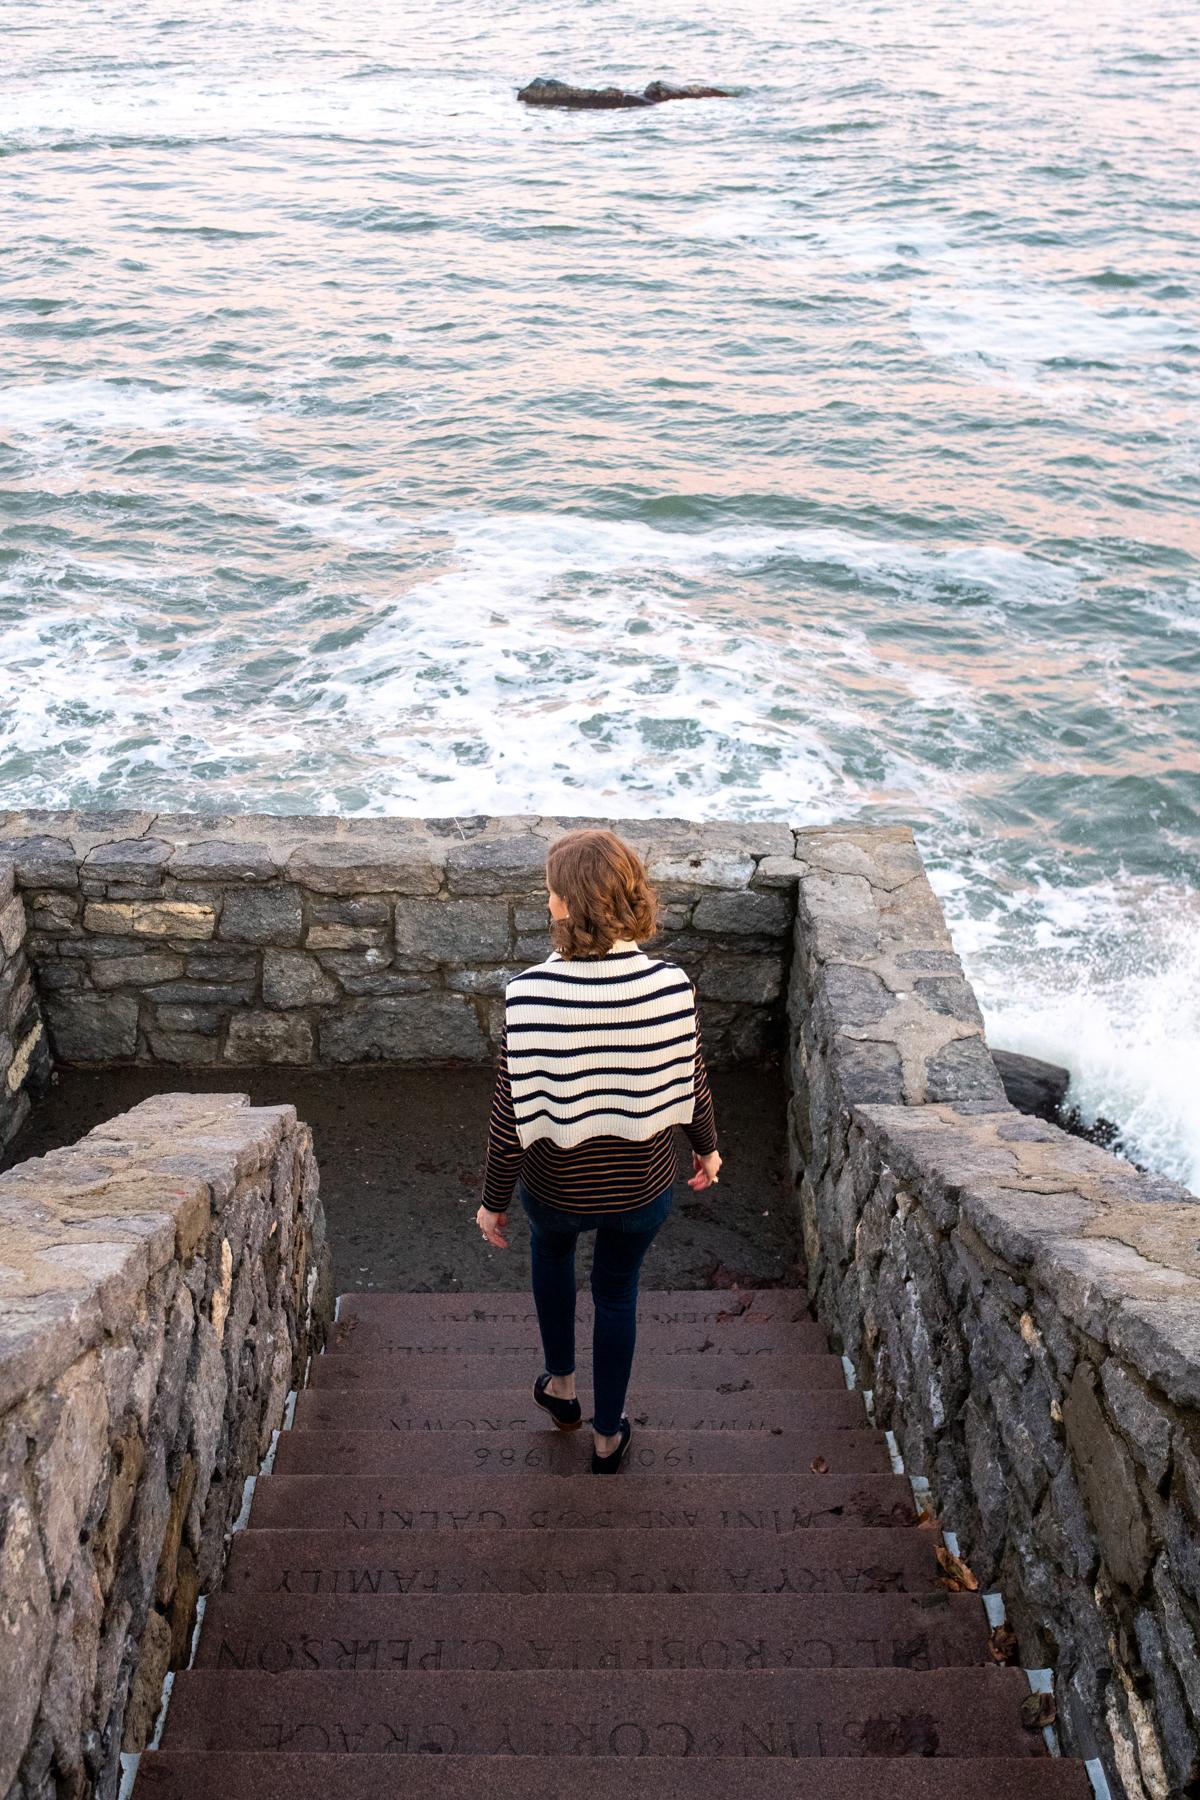 Newport%2C Rhode Island Weekend Travel Guide x Stacie Flinner-86.jpg